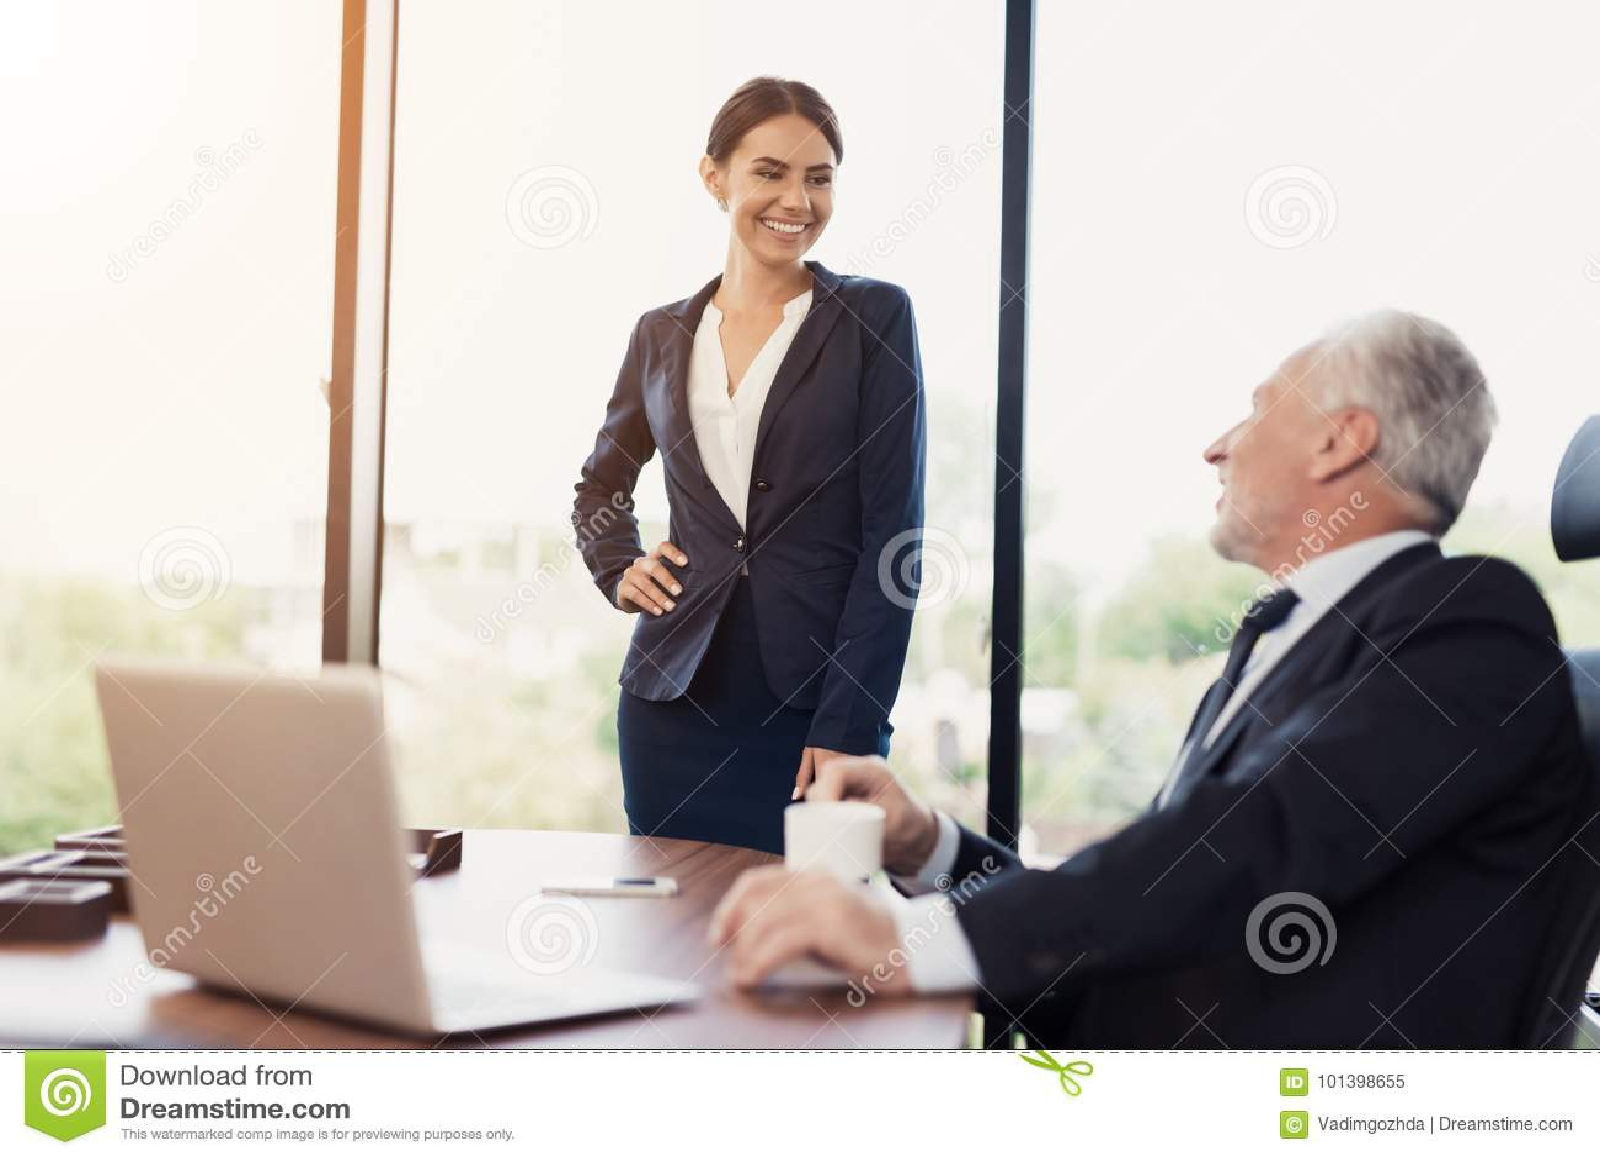 Секретарша и её босс